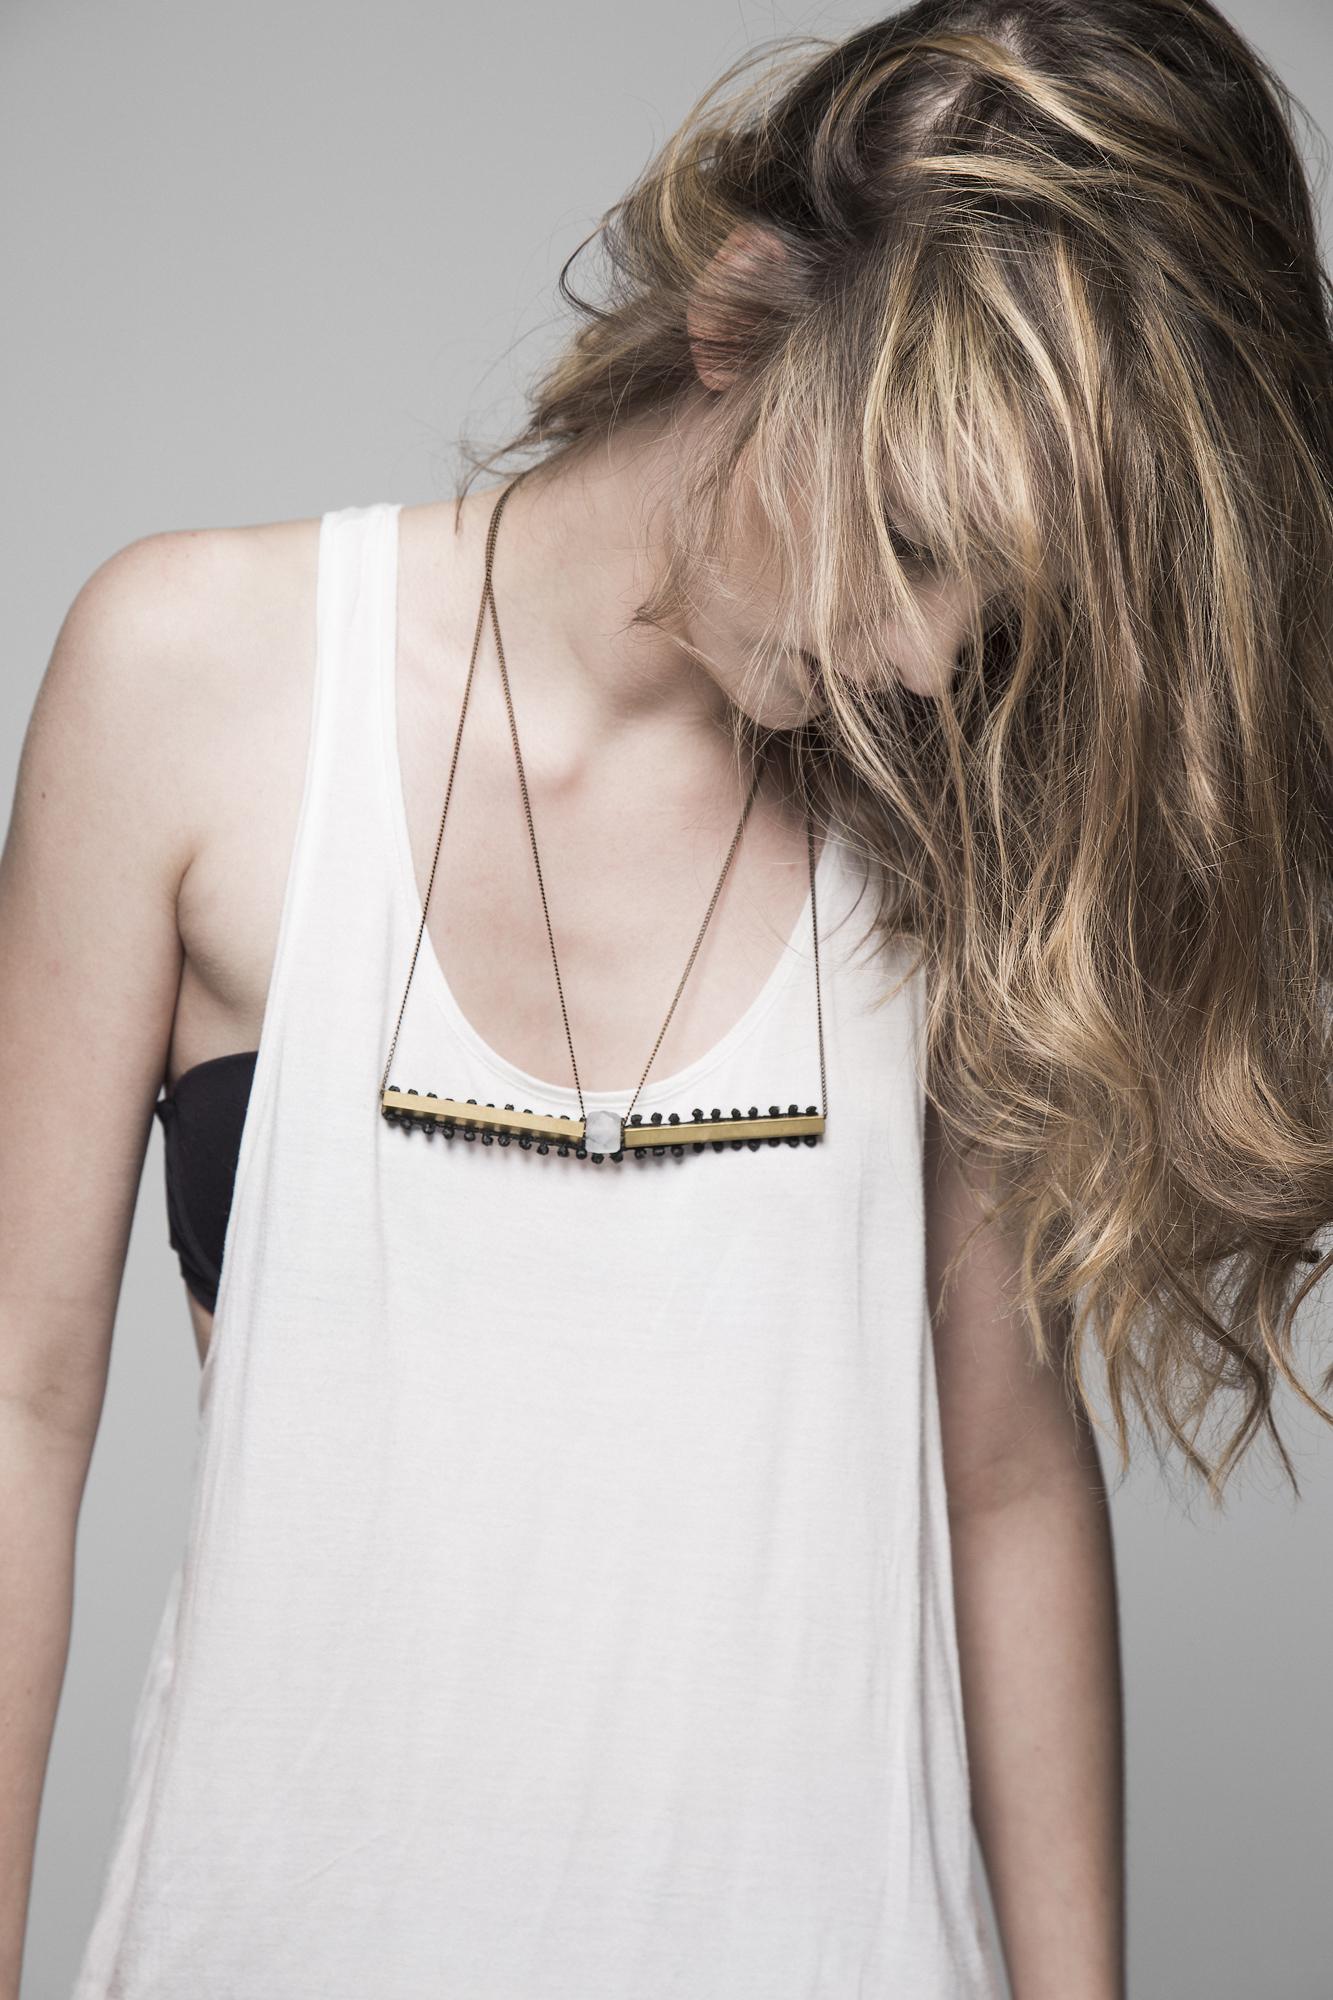 Horizon necklace (details here)